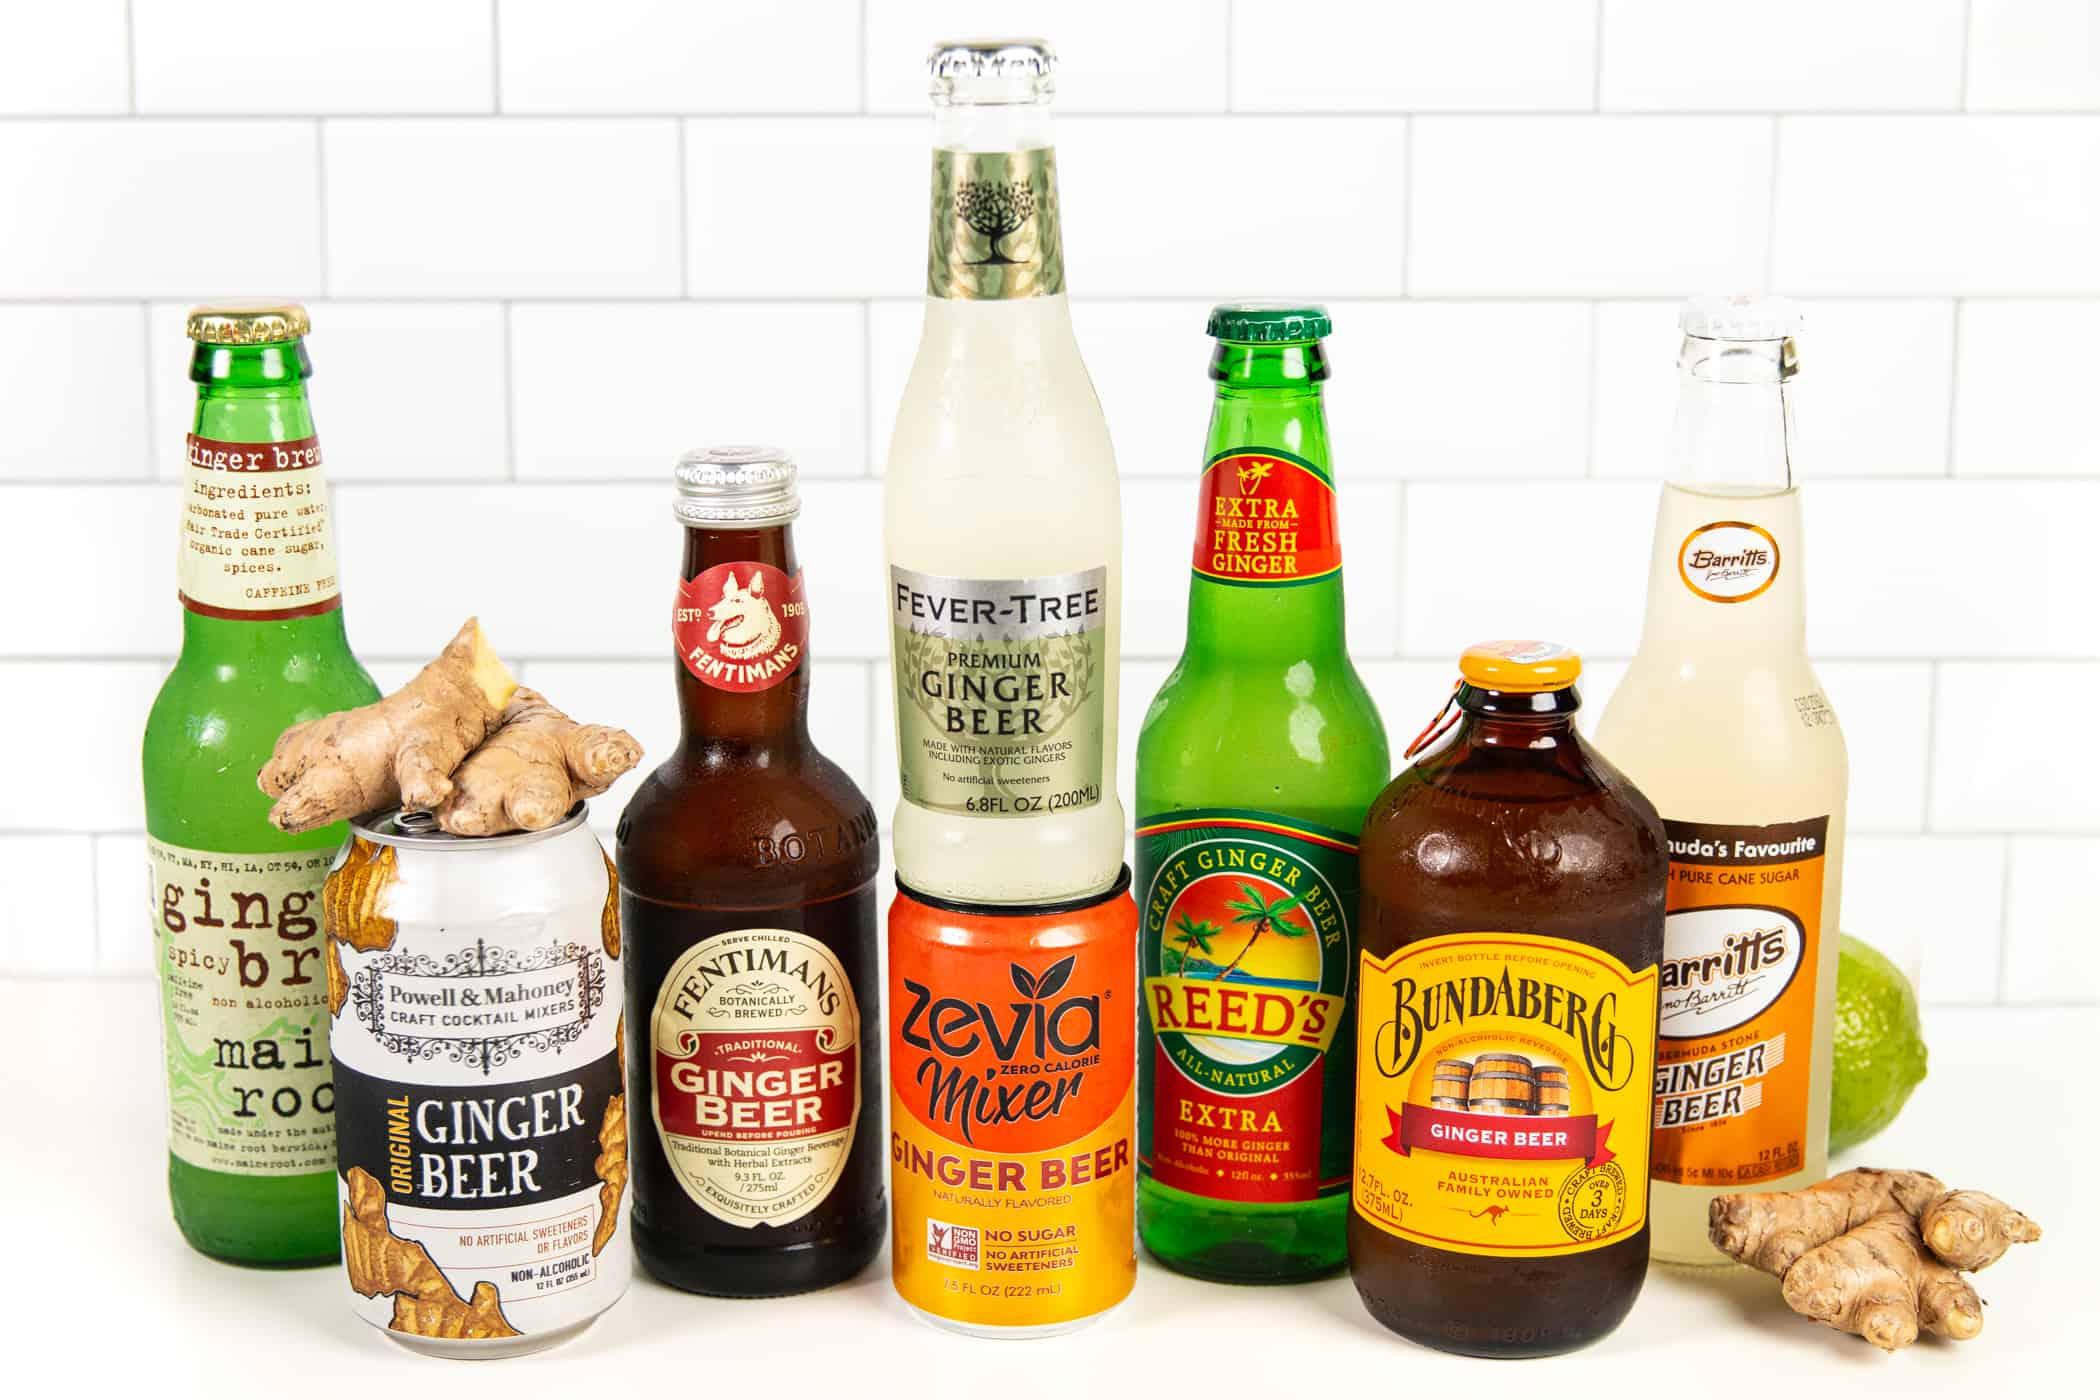 8 bottles of ginger beer on a white tile counter